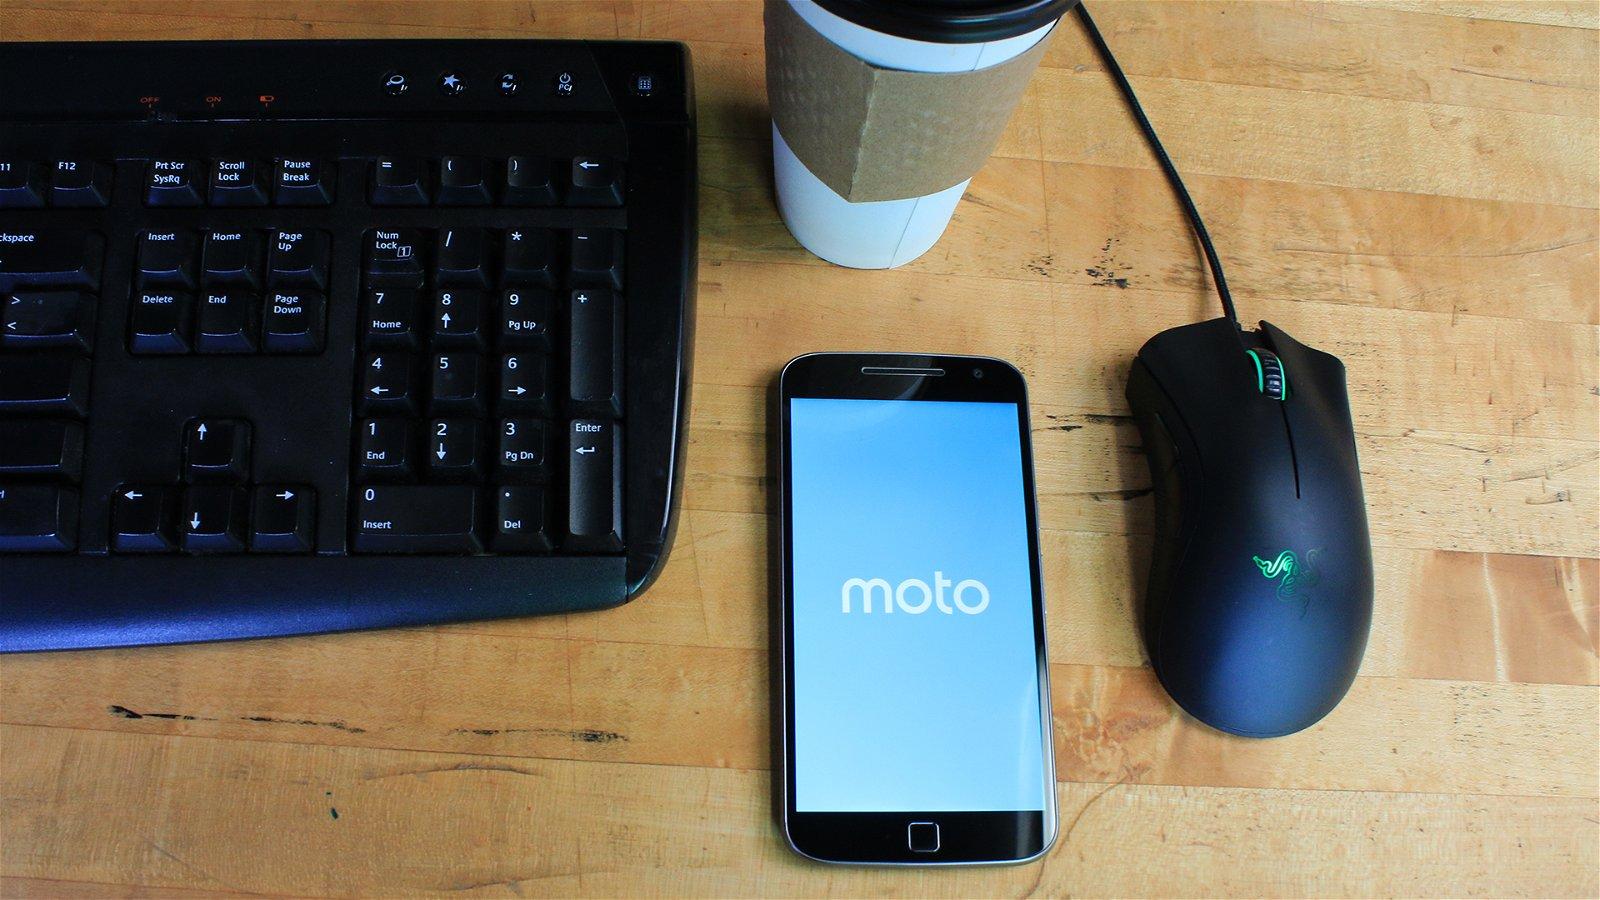 Moto G4 Plus (Smartphone) Review 19